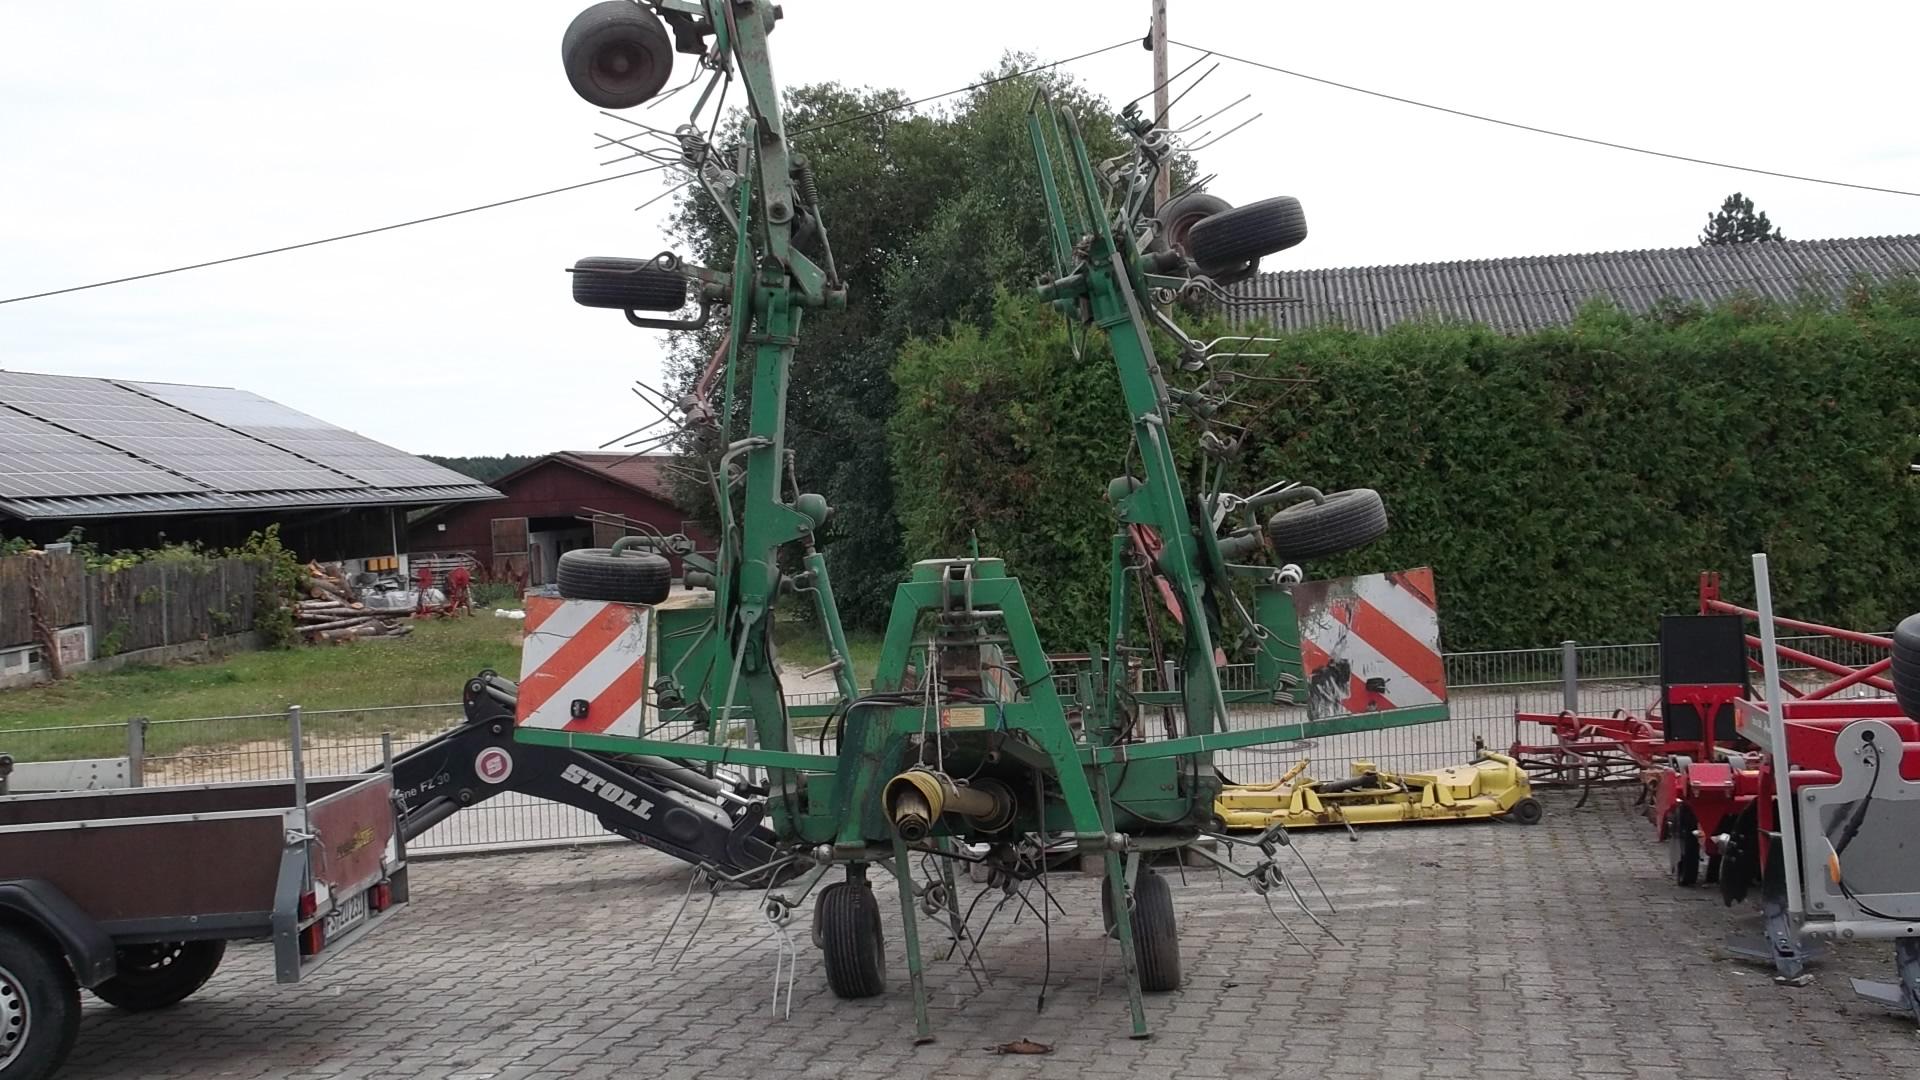 Stoll Kreiselheuer Z 900 Hydro